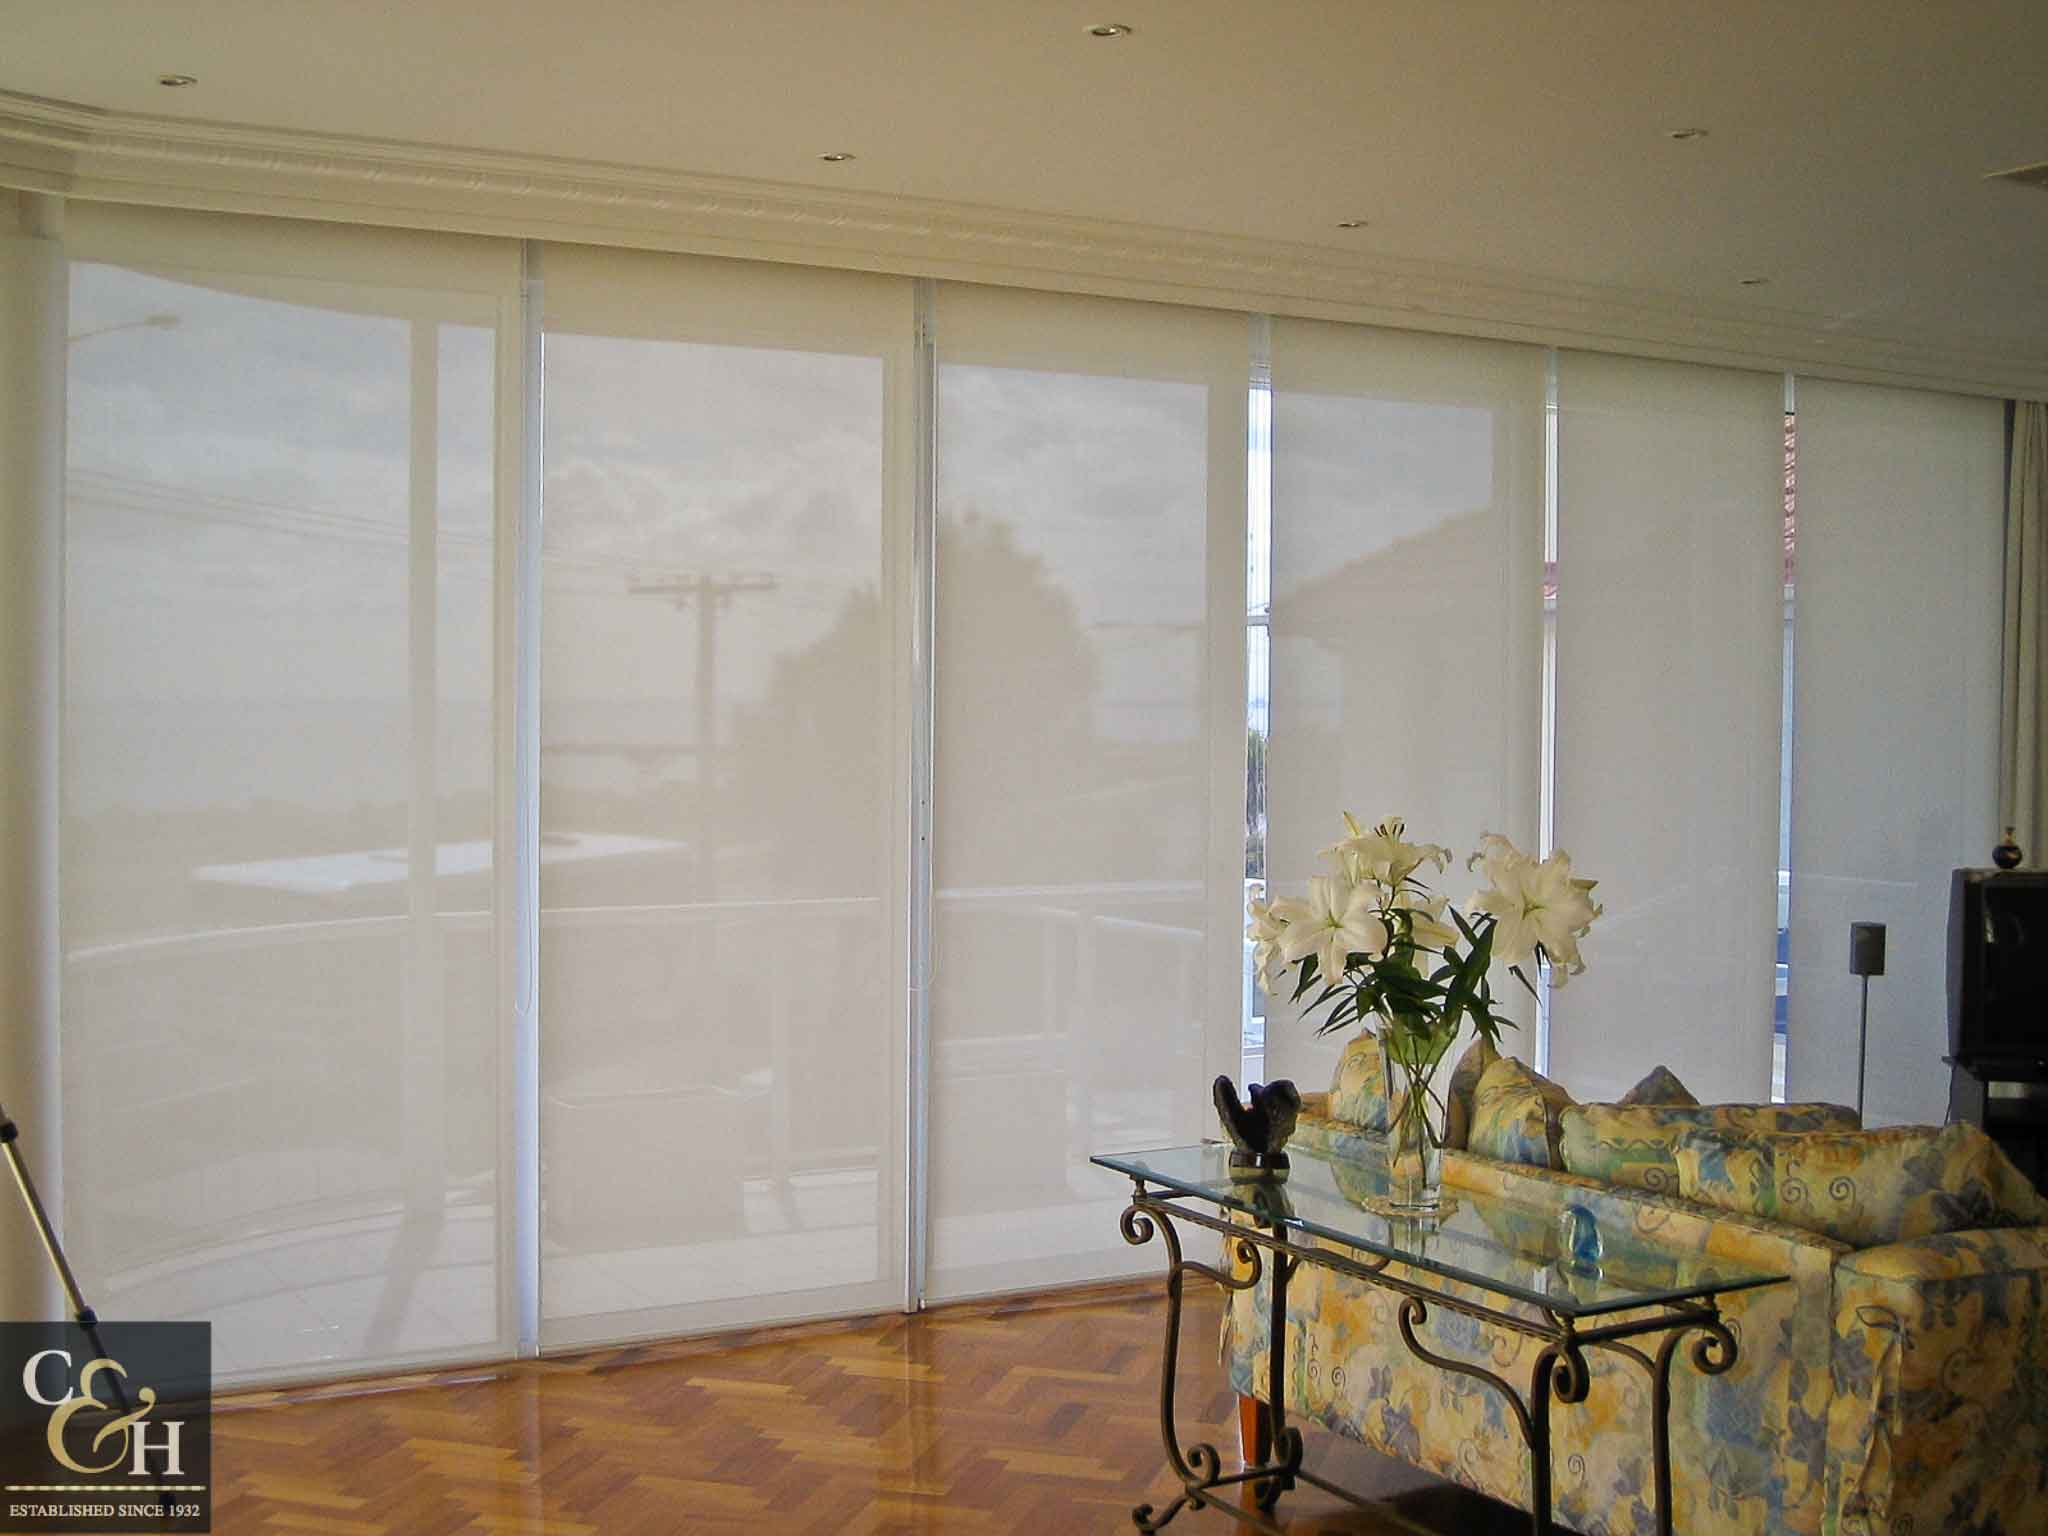 Screen-Roller-Blinds-22 inside a living room